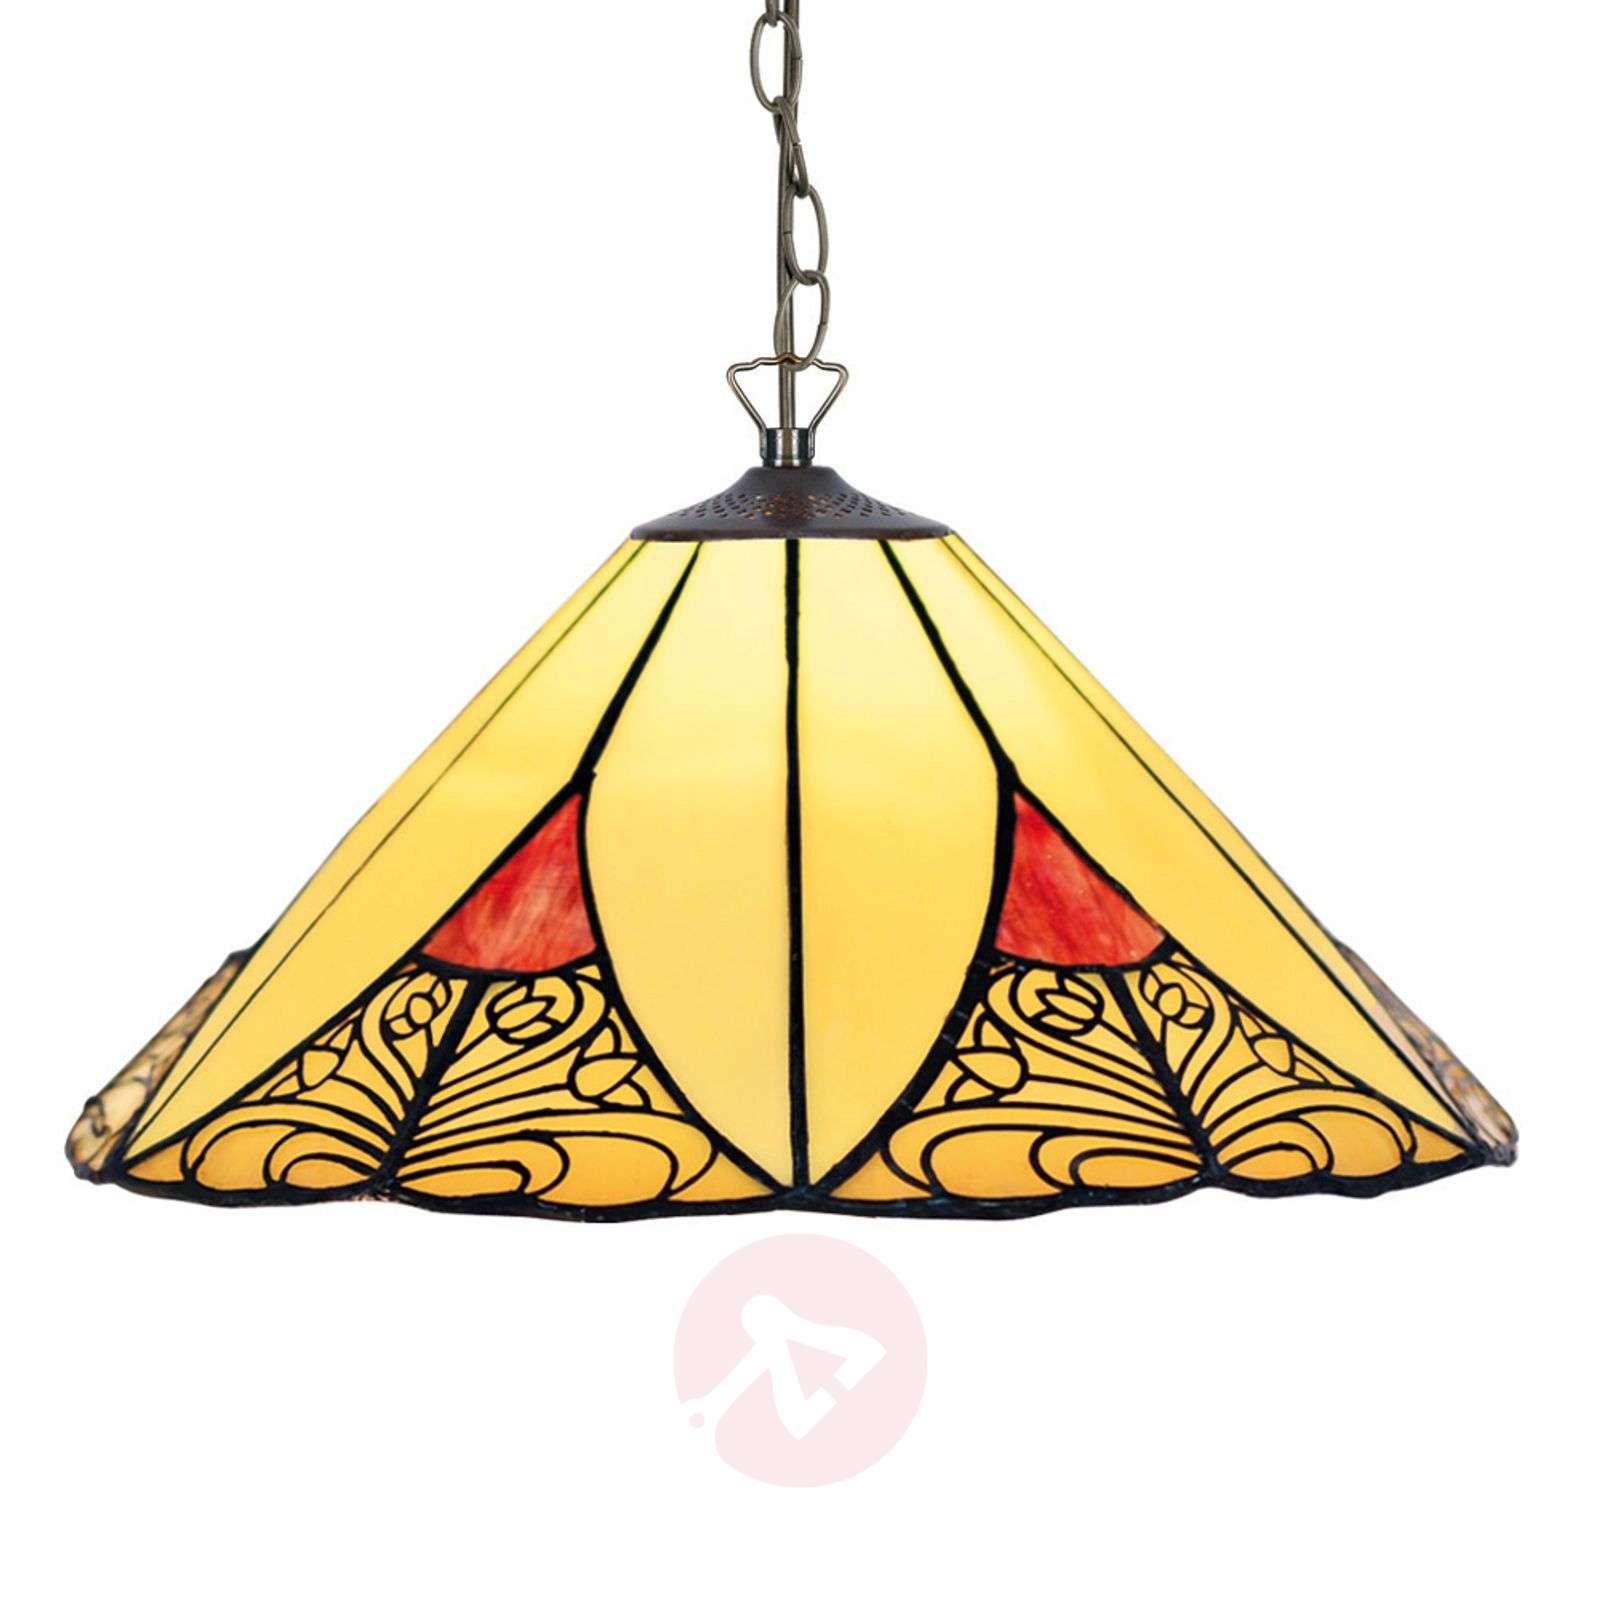 Tiffany design hanging light elisa